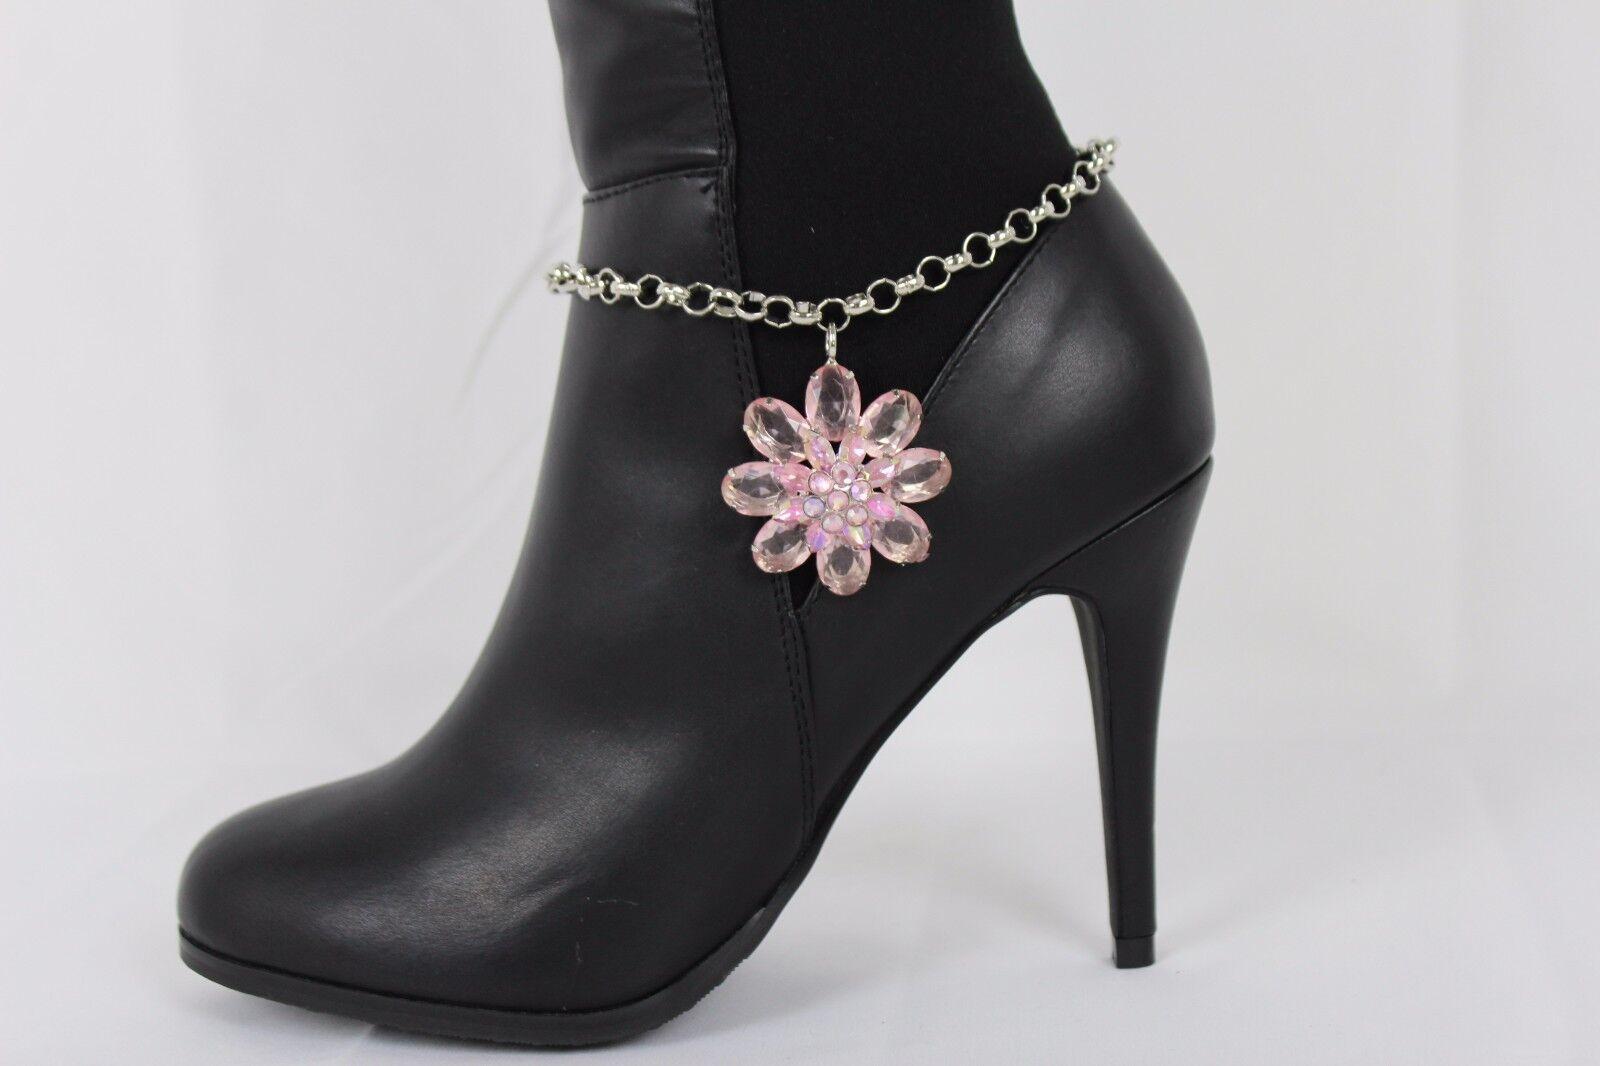 Women Silver Metal Chain Boot Bracelet Shoe Big Pink Flower Charm Jewelry Anklet